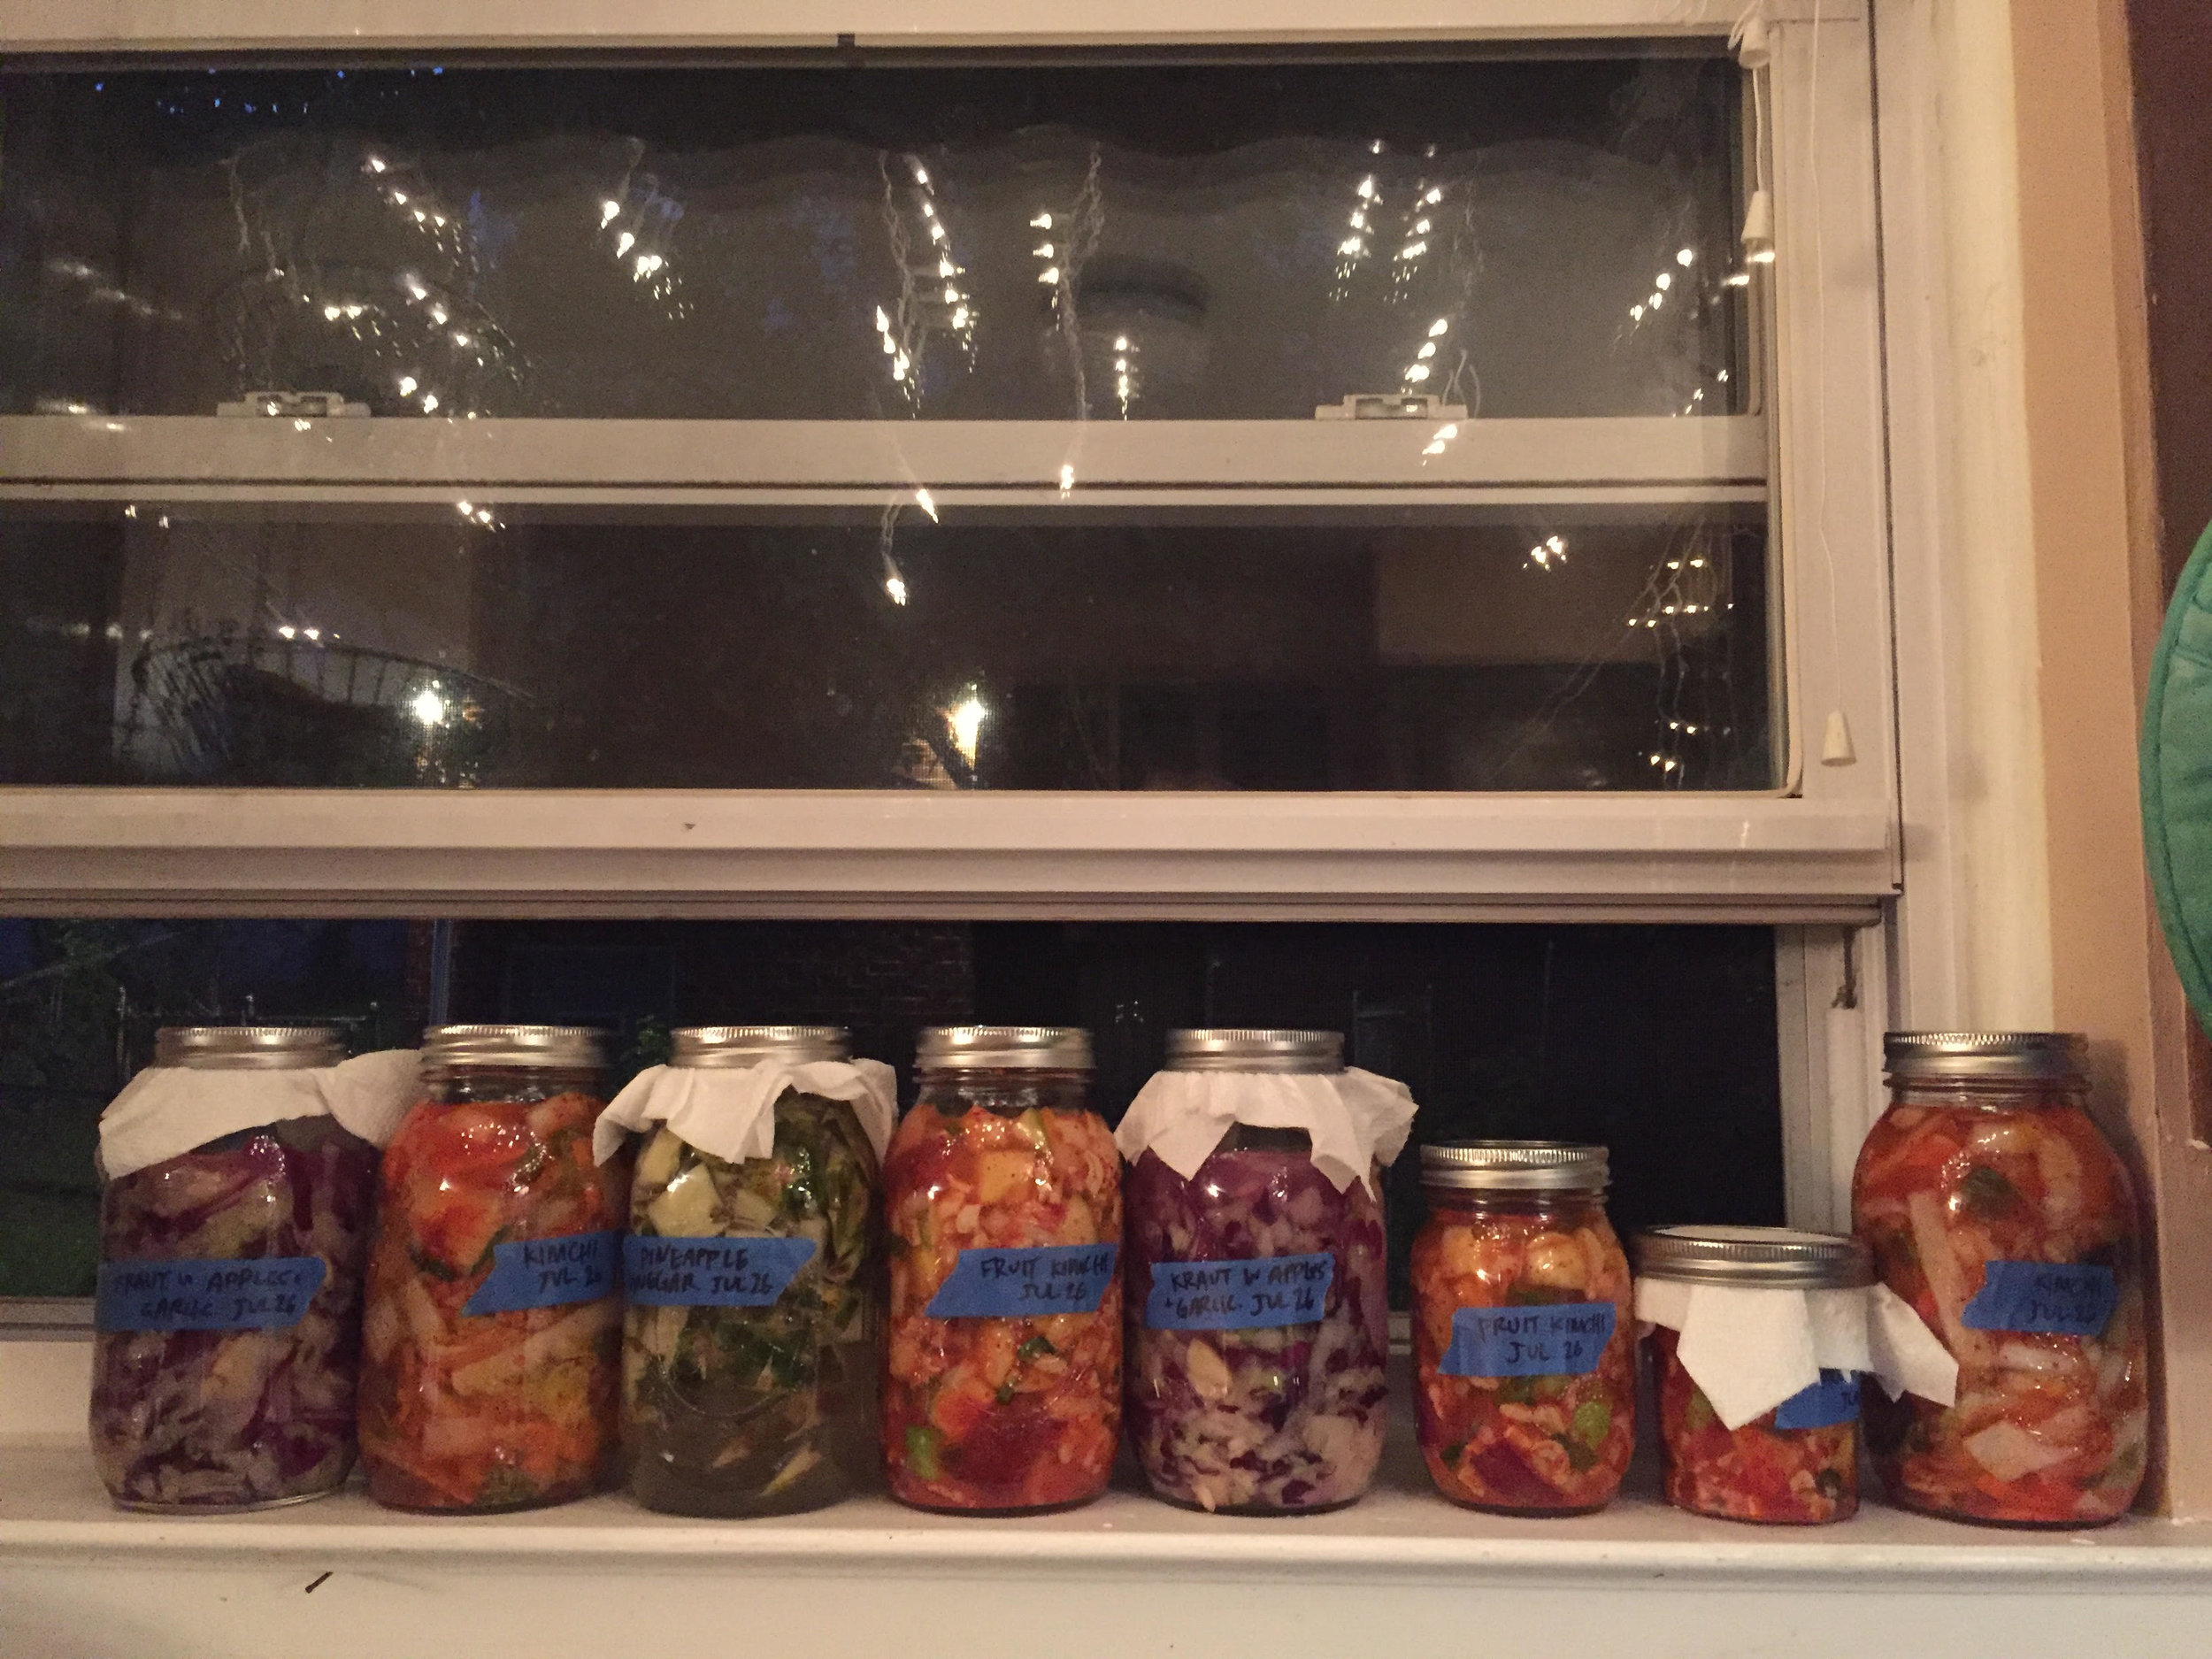 My kitchen, July 2016: sauerkraut, pineapple vinegar, cabbage kimchi, and fruit kimchi.